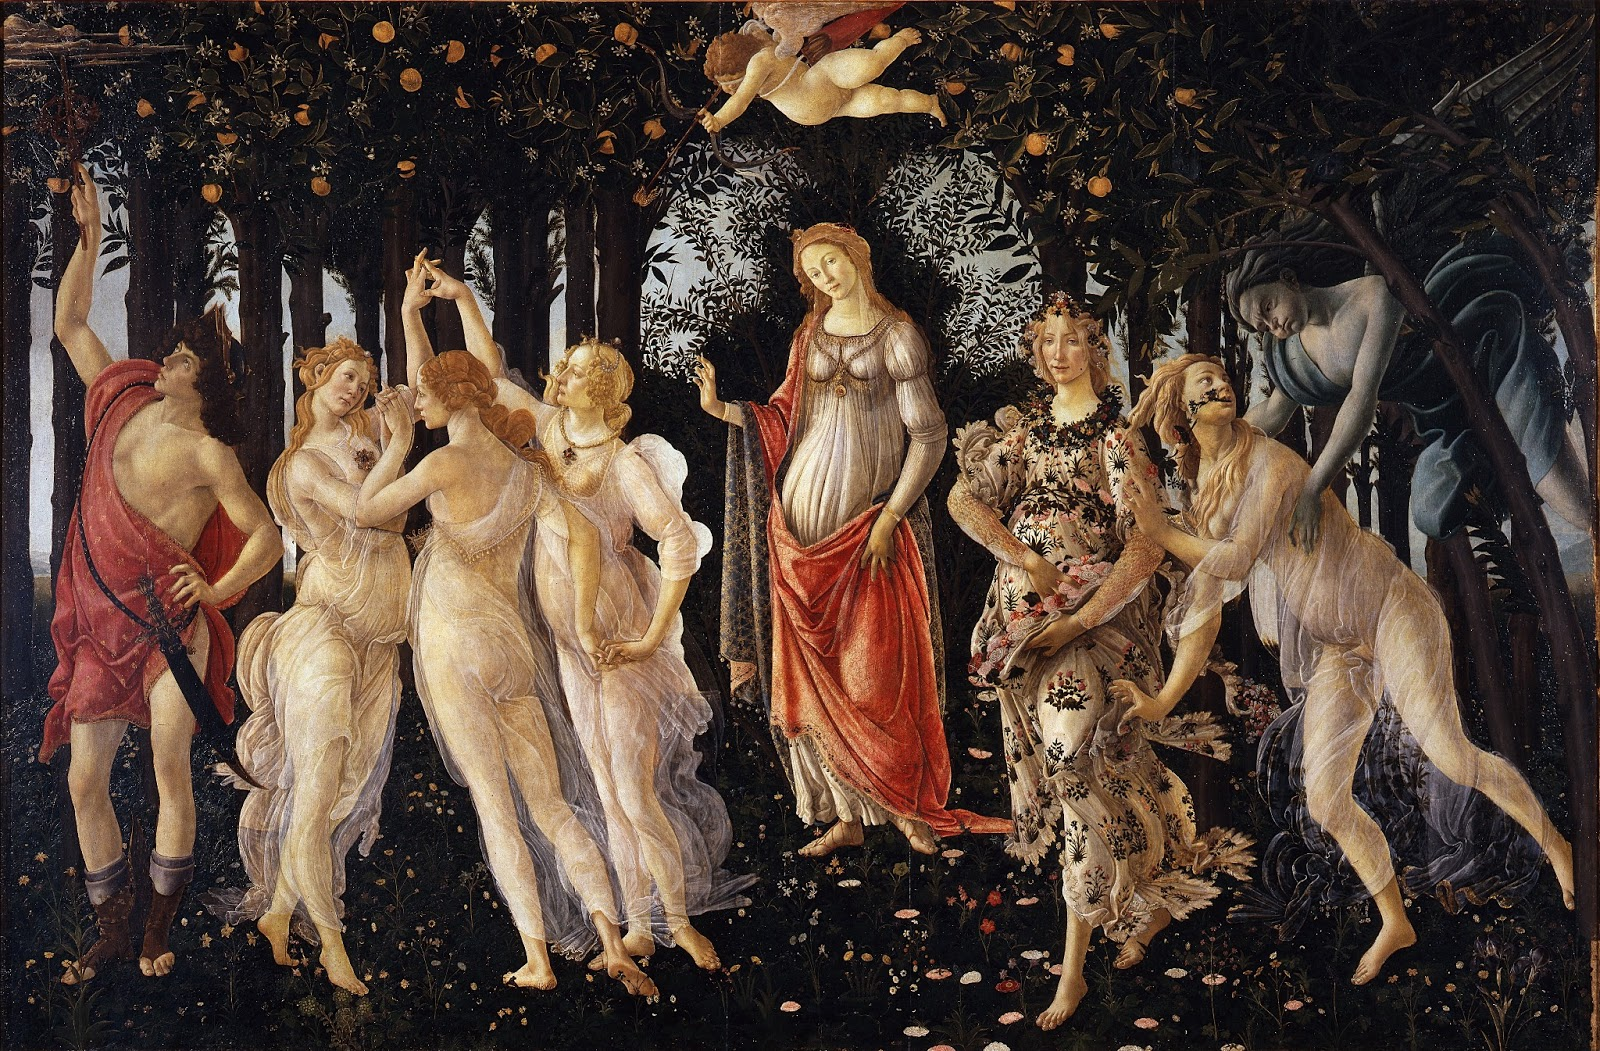 Bensozia The Strange Symbolism Of Botticellis Primavera